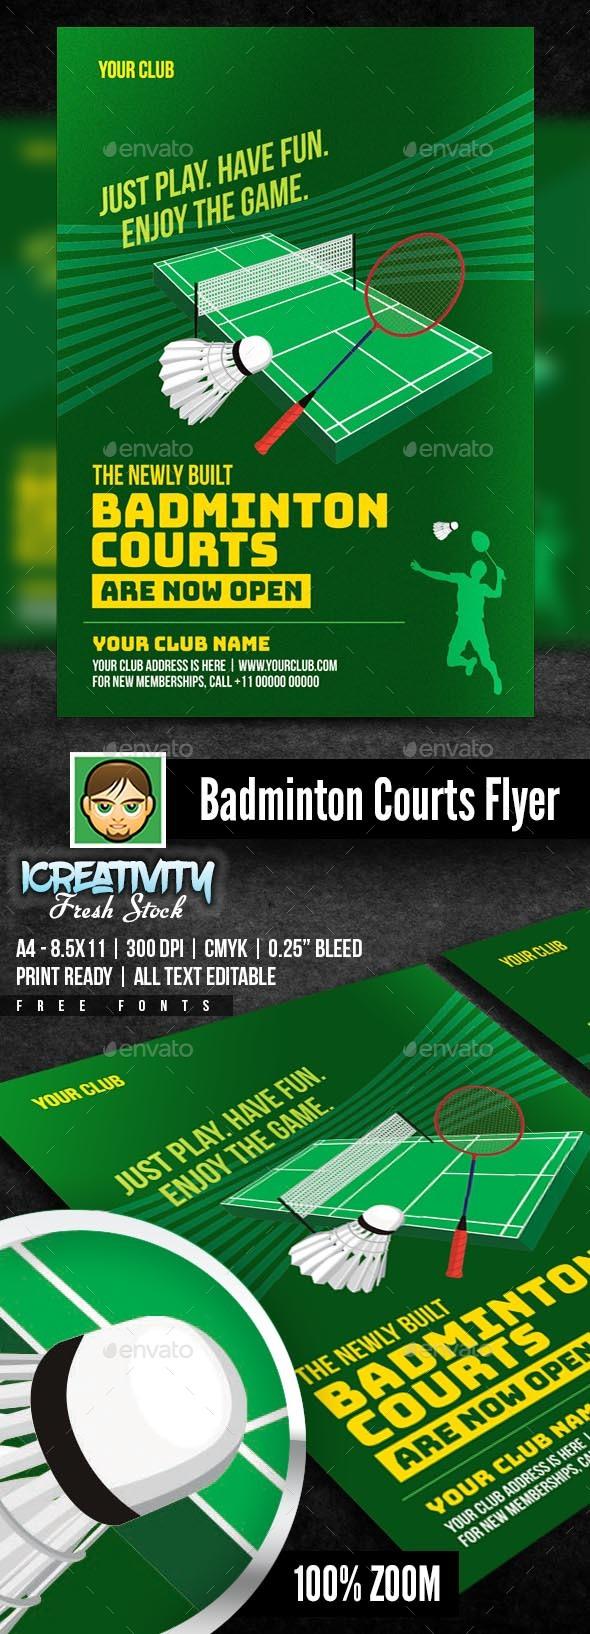 Badminton Courts Flyer - Flyers Print Templates